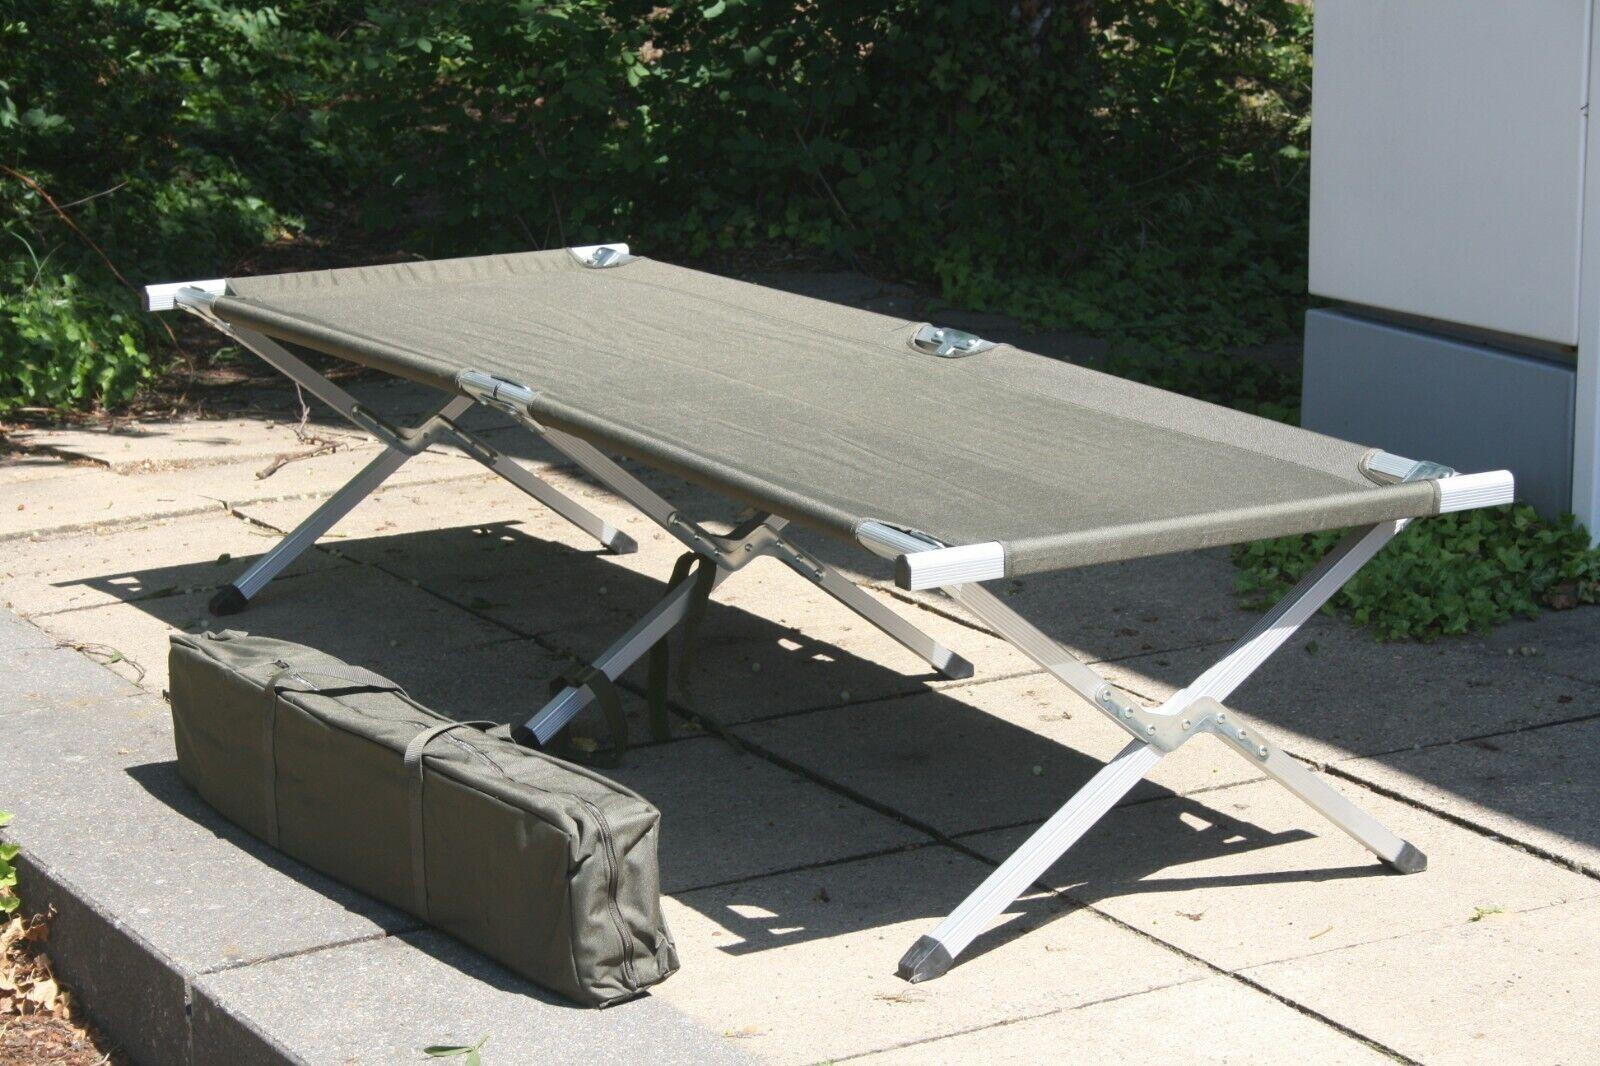 US FELDBETT KLAPPBAR ALUMINIUM BW KLAPPBETT 120kg ARMY CAMPINGLIEGE OUTDOOR OLIV